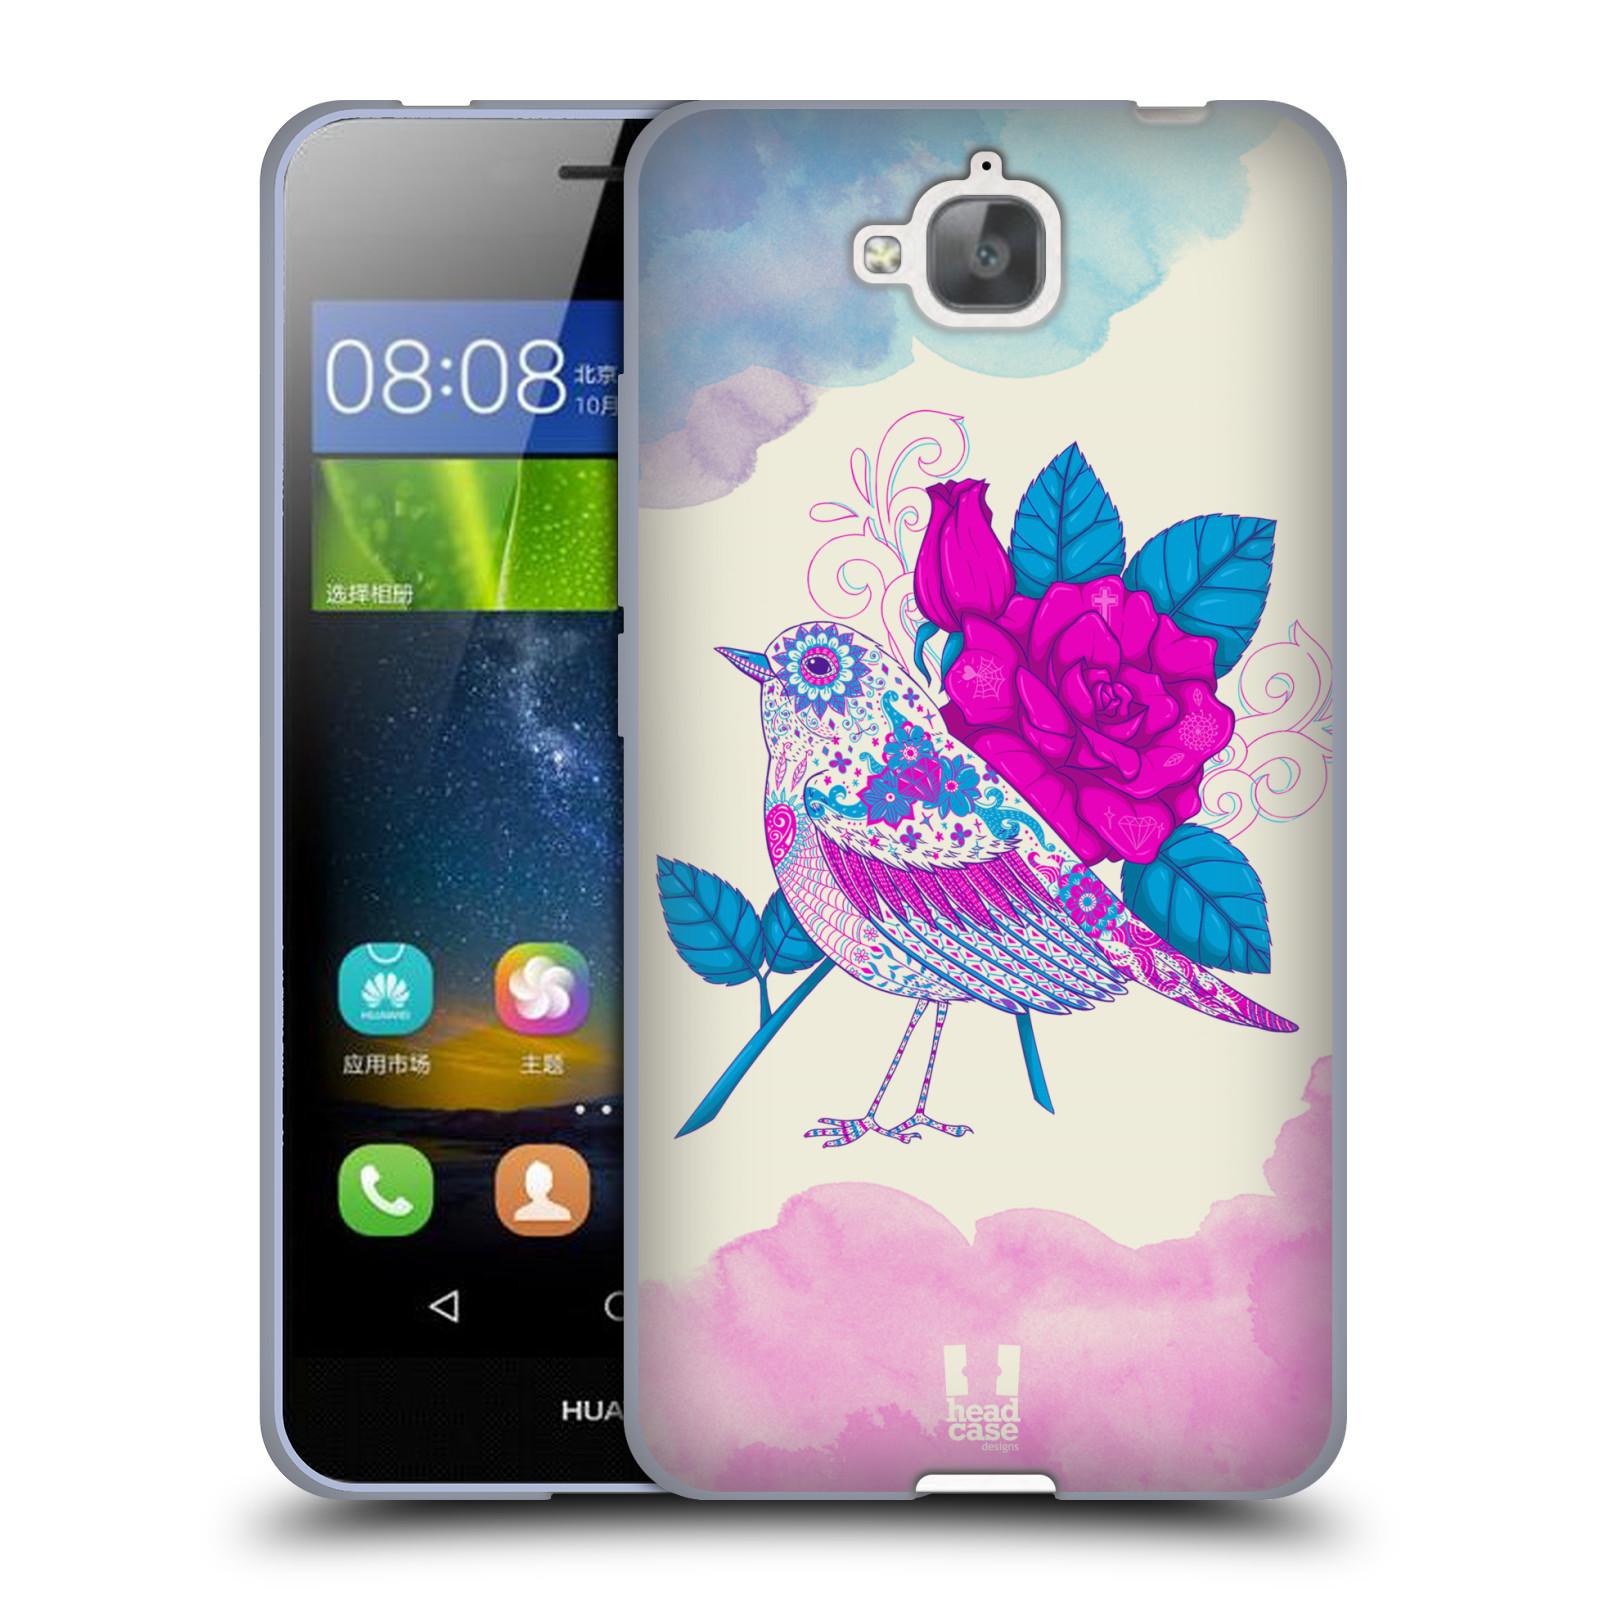 Silikonové pouzdro na mobil Huawei Y6 Pro Dual Sim HEAD CASE PTÁČEK FUCHSIA